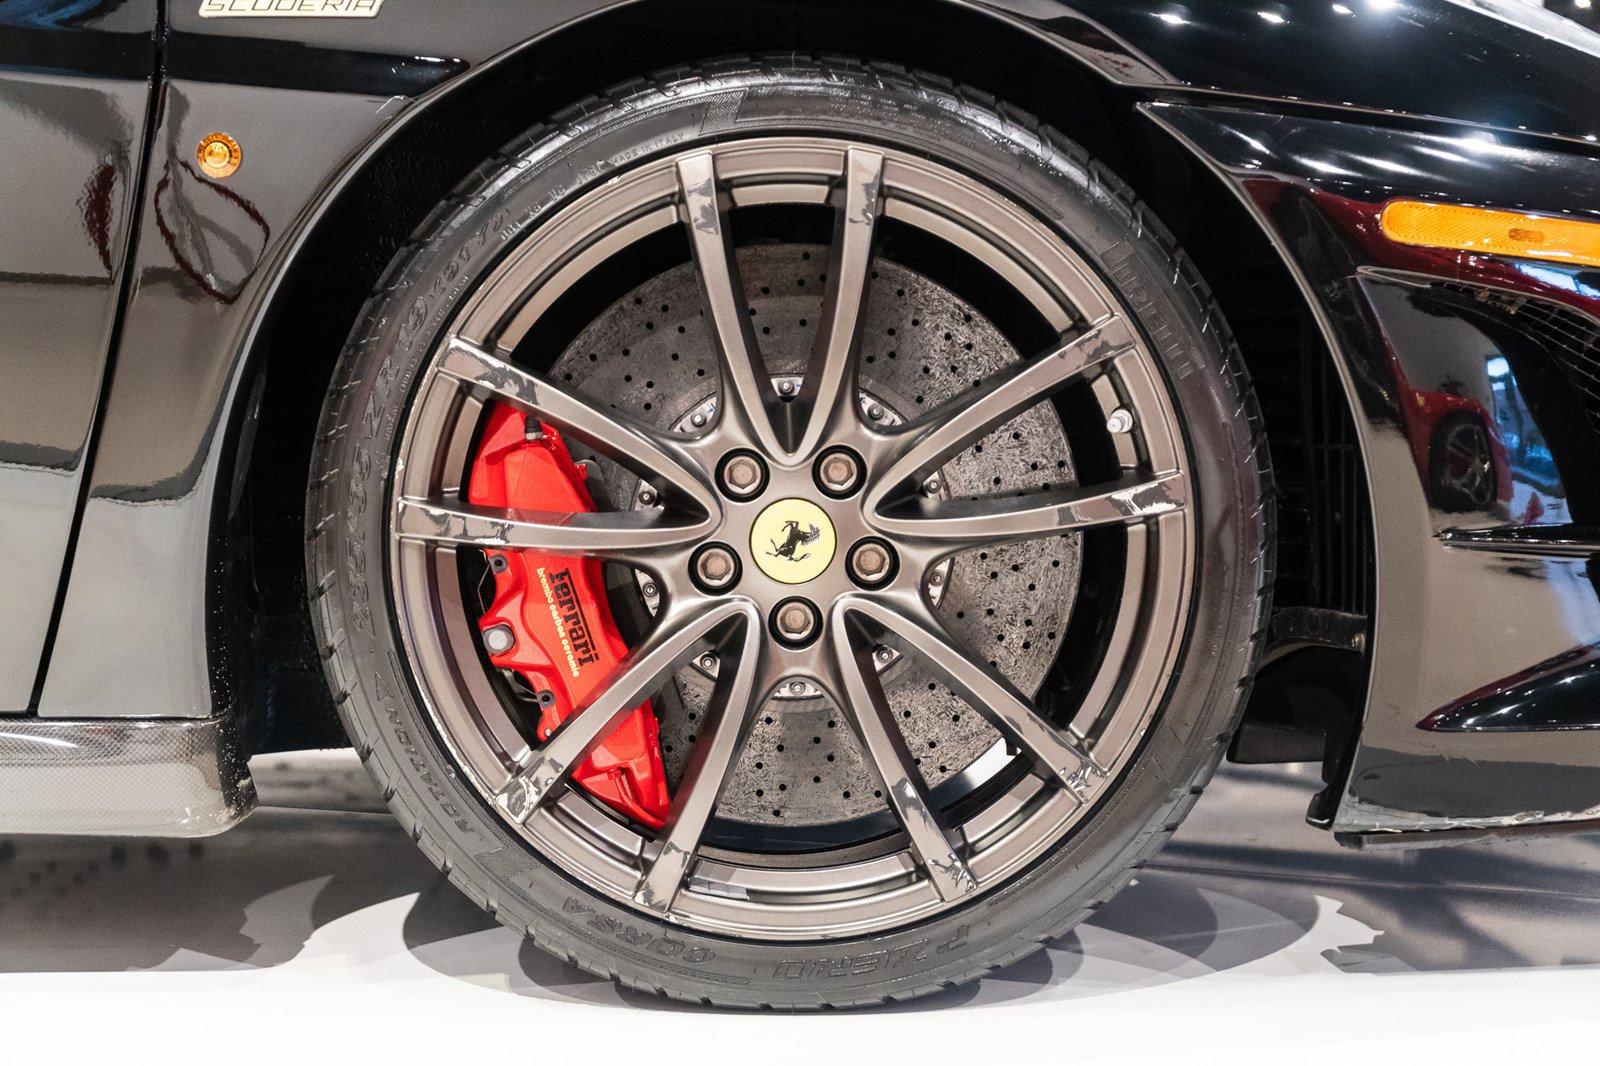 Pre-Owned 2009 Ferrari 430 Scuderia Spider 16M